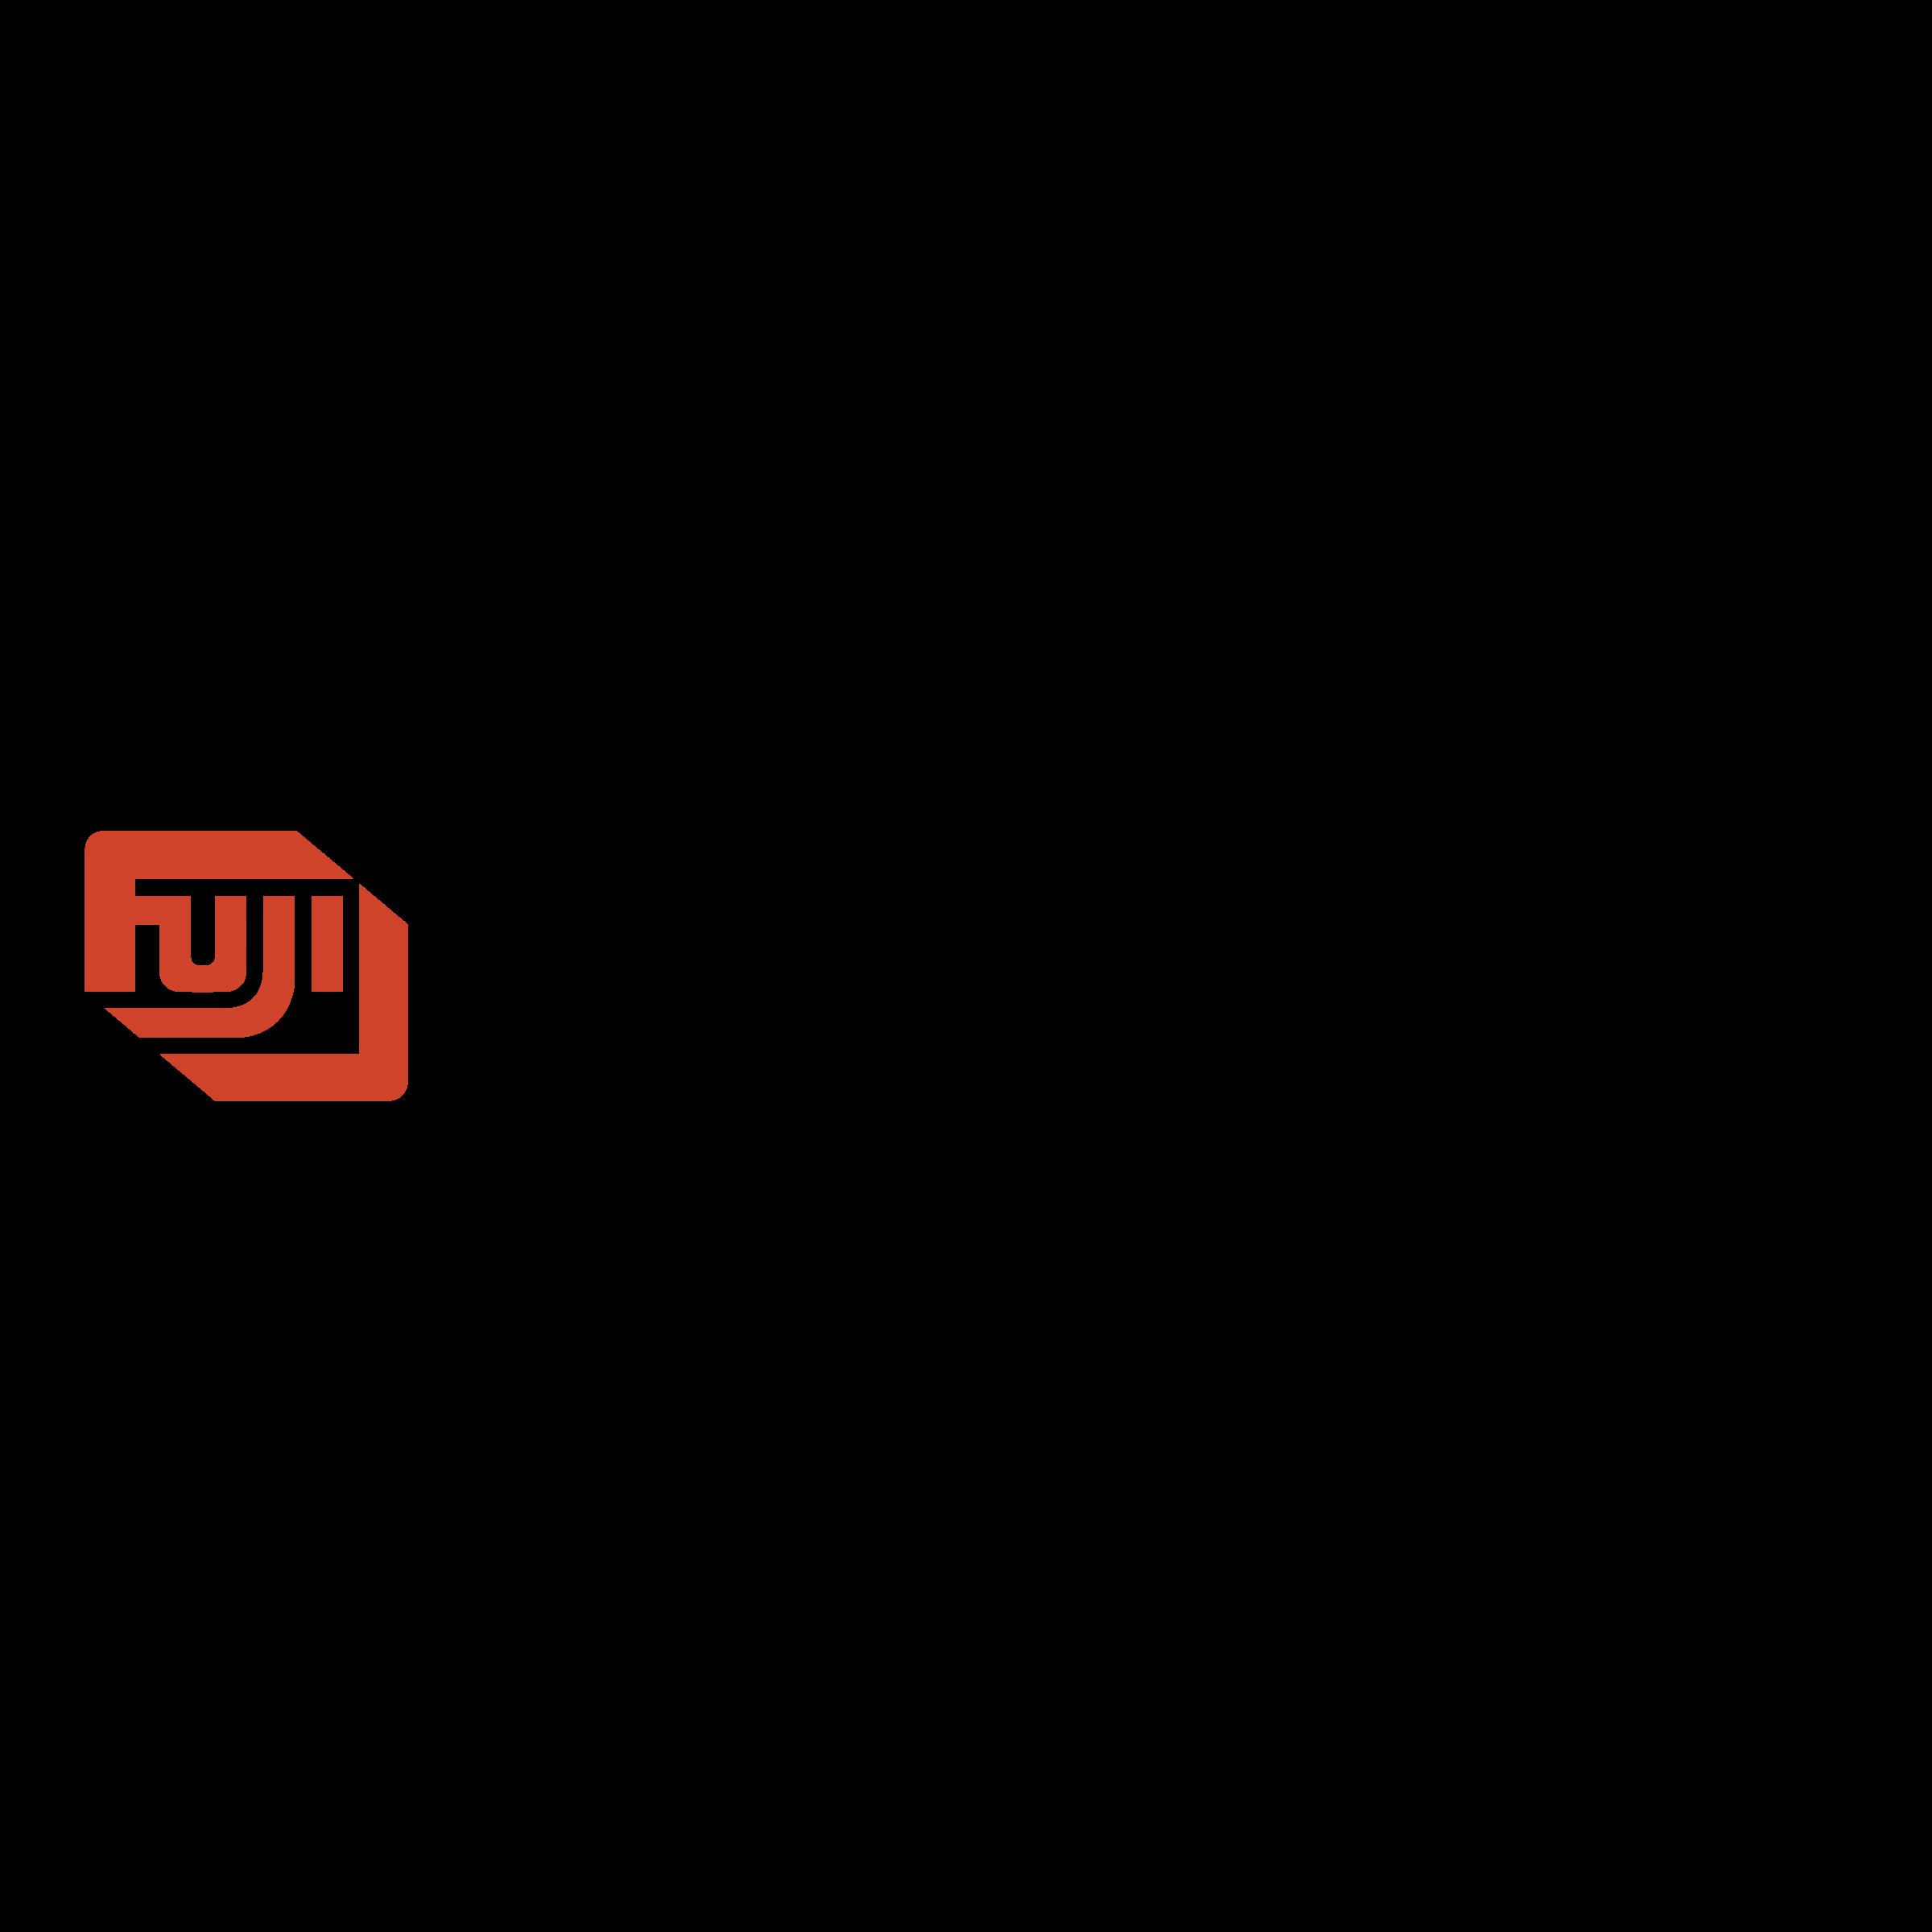 fujifilm-9-logo-png-transparent